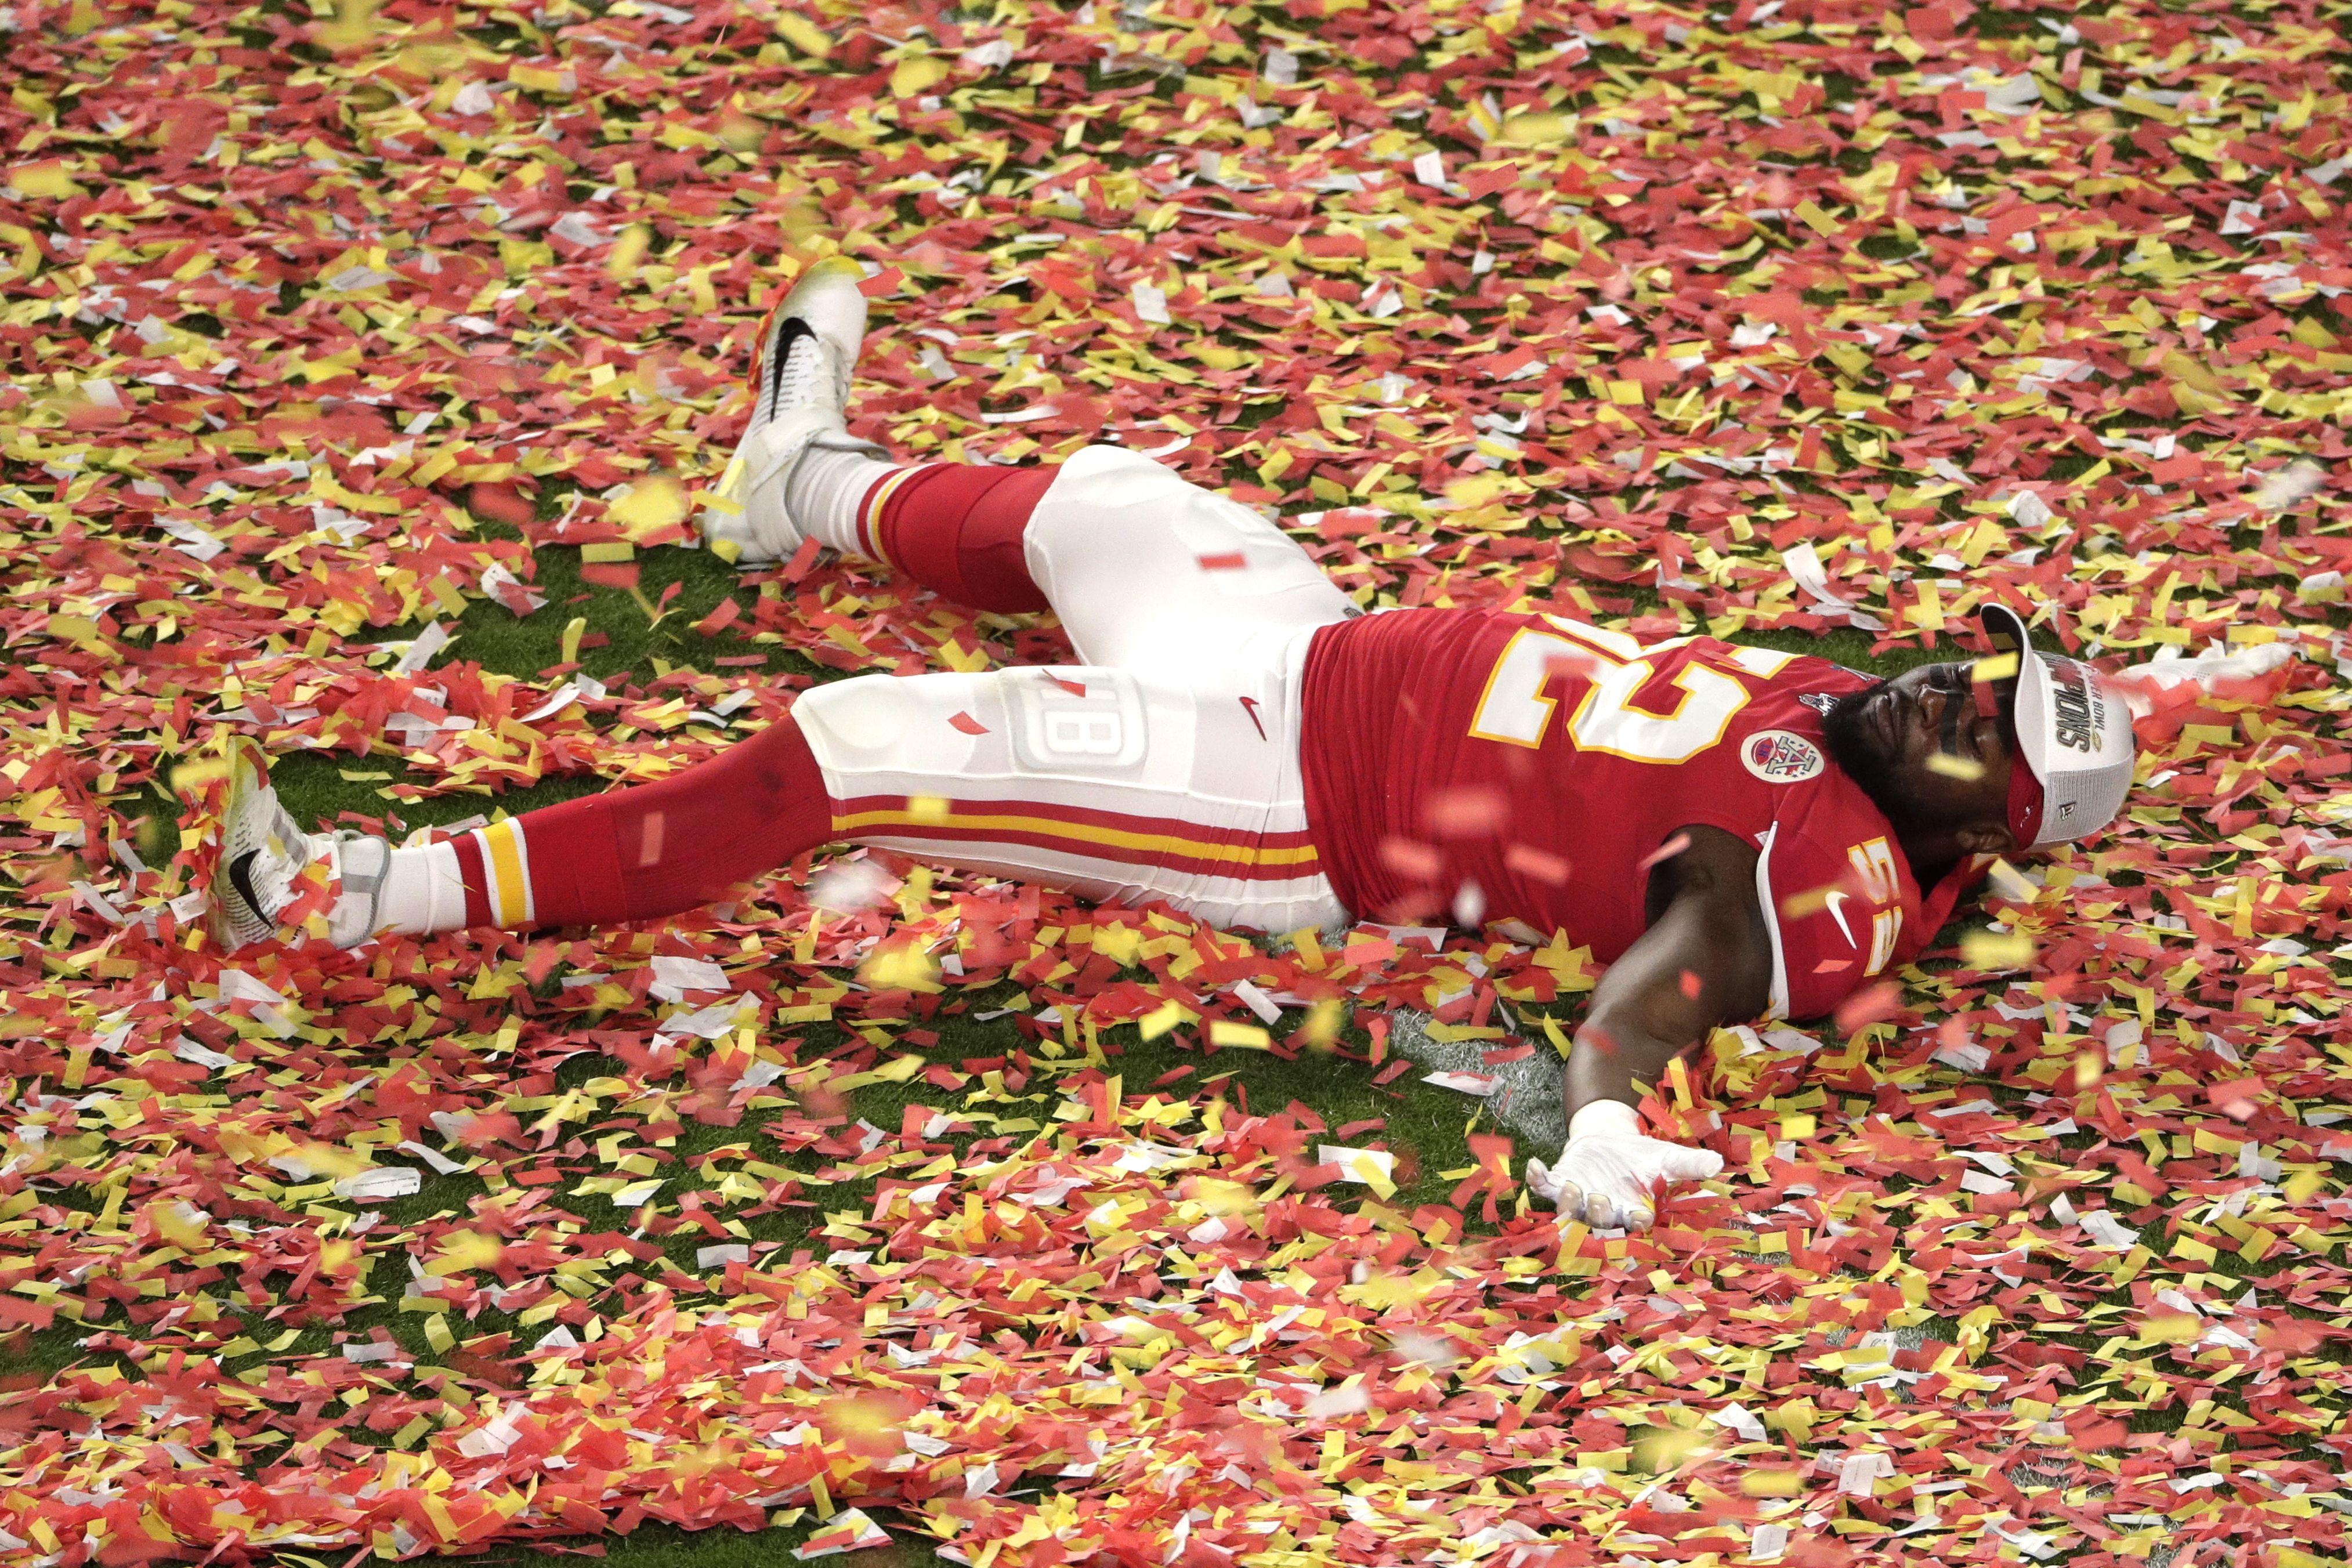 Ergebnis Super Bowl